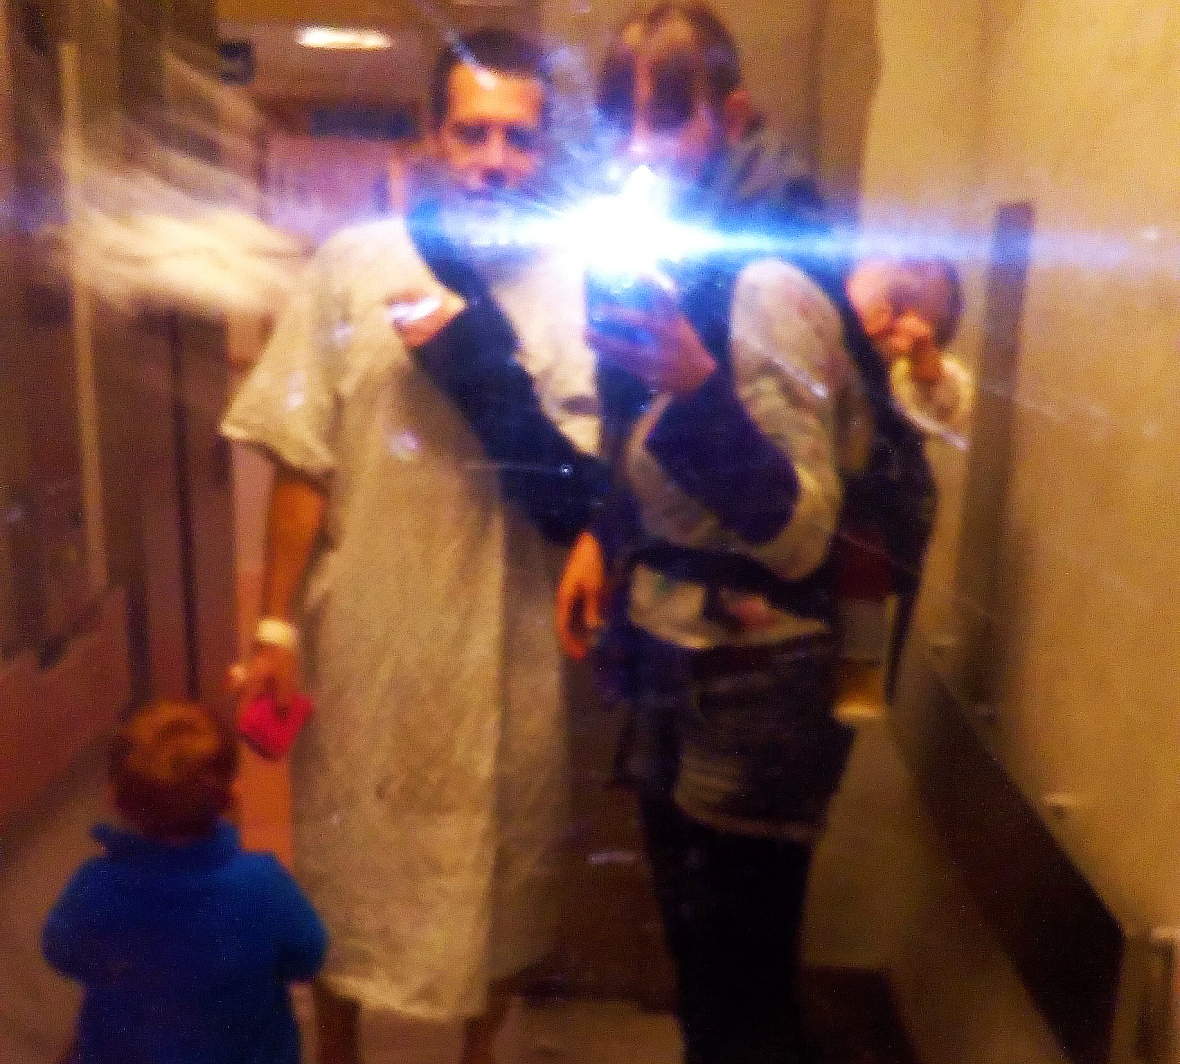 hospital-mirror